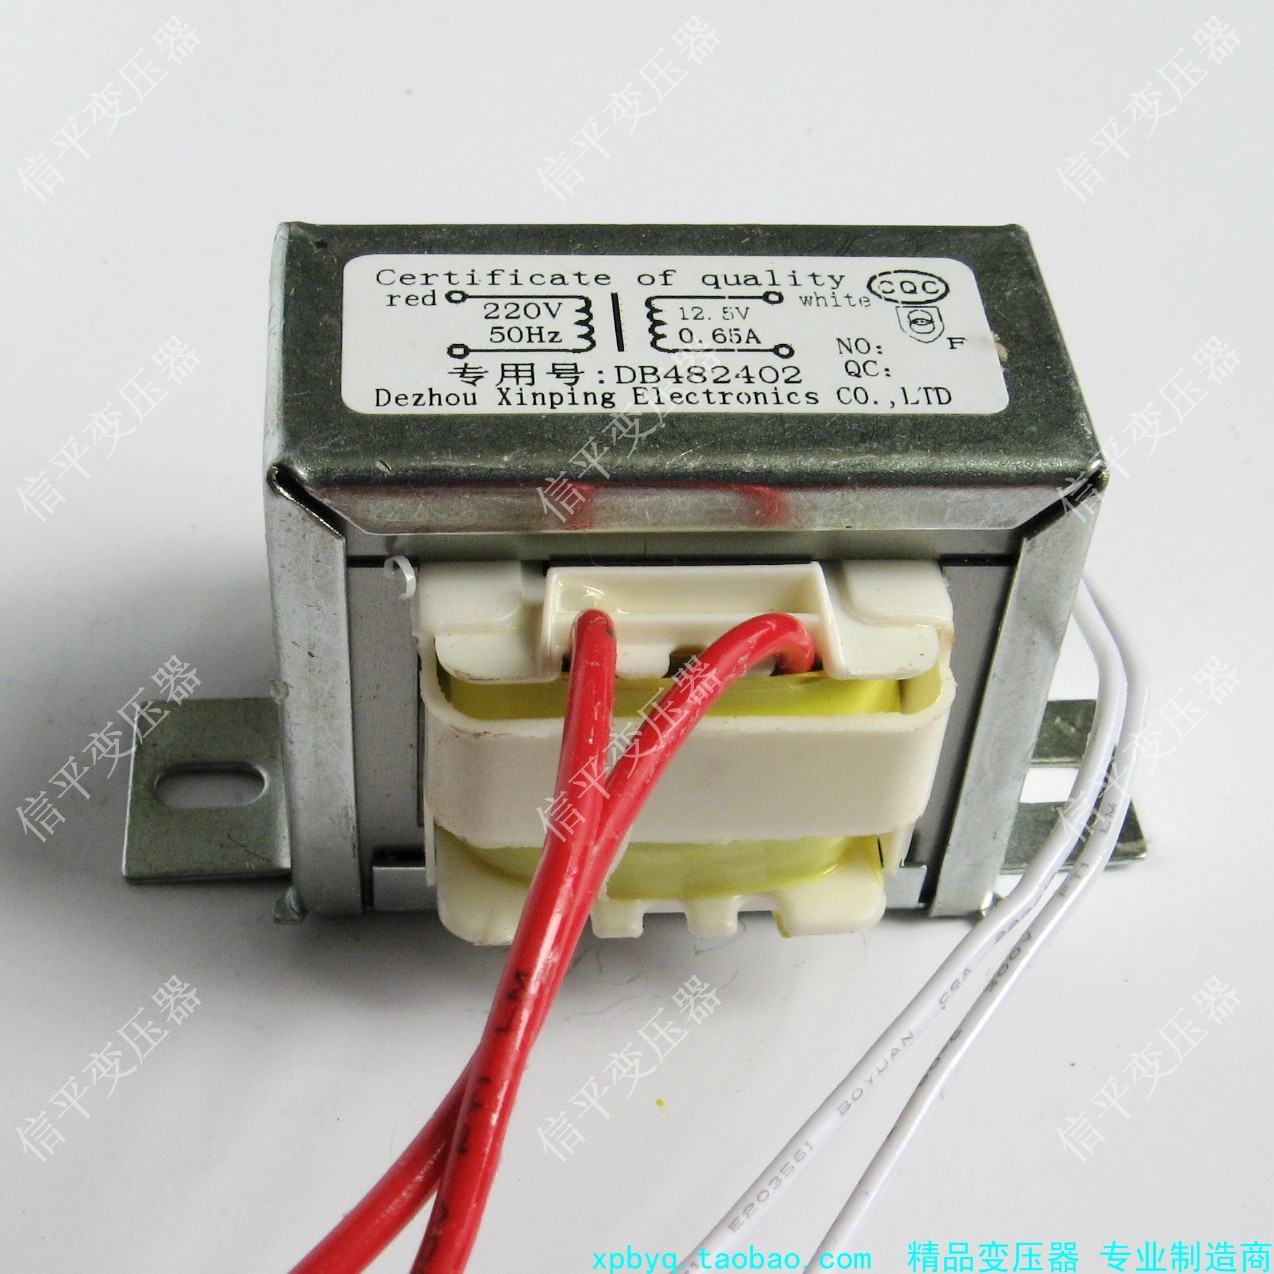 Электронный трансформатор Letter e  CQC